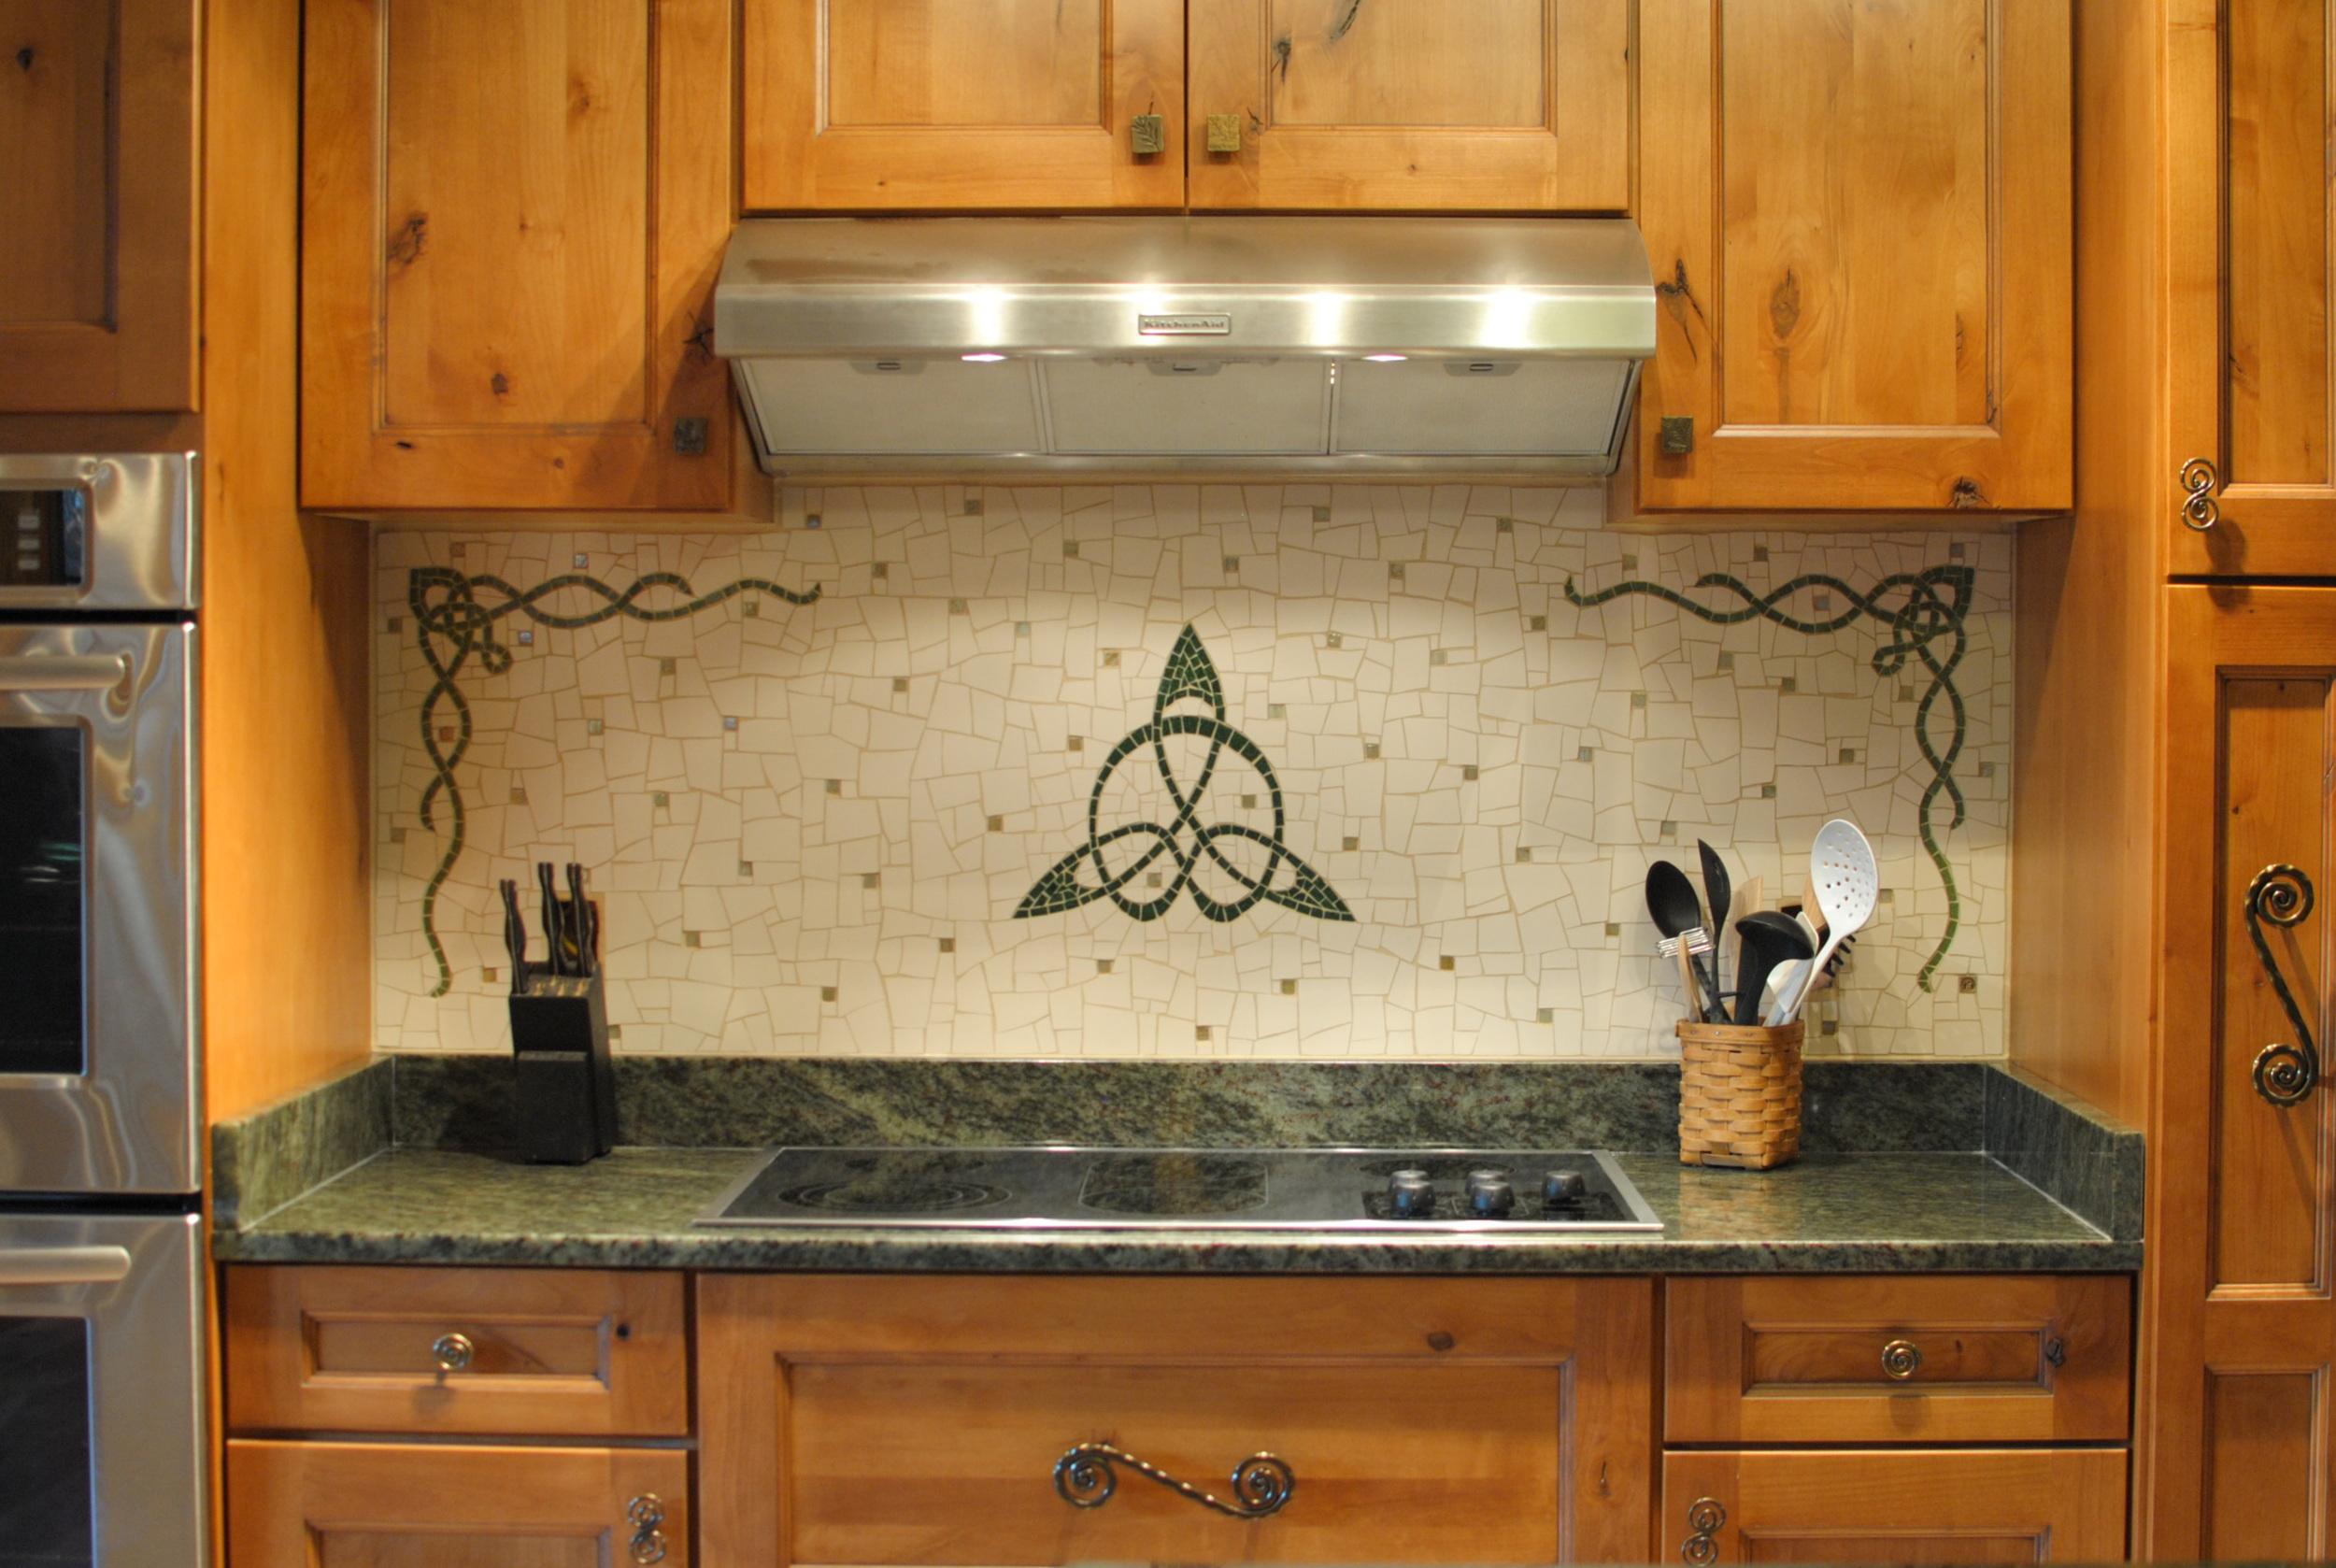 Celtic mosaic kitchen backsplash